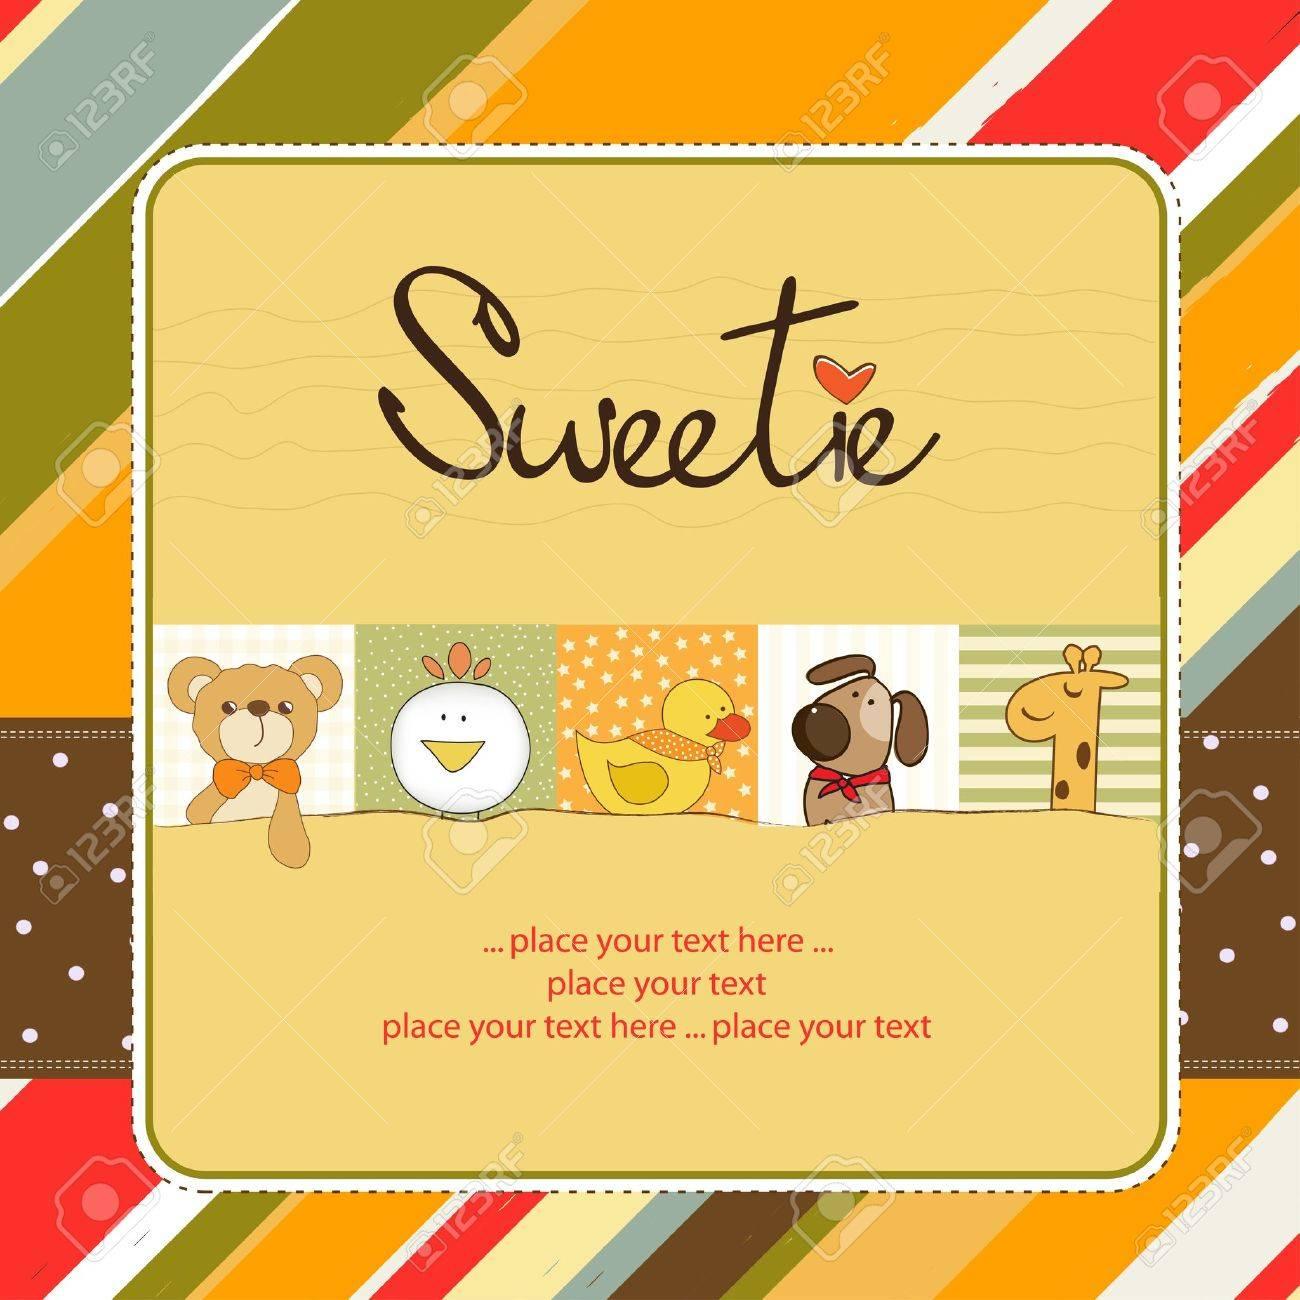 sweetie greeting card Stock Vector - 11154343